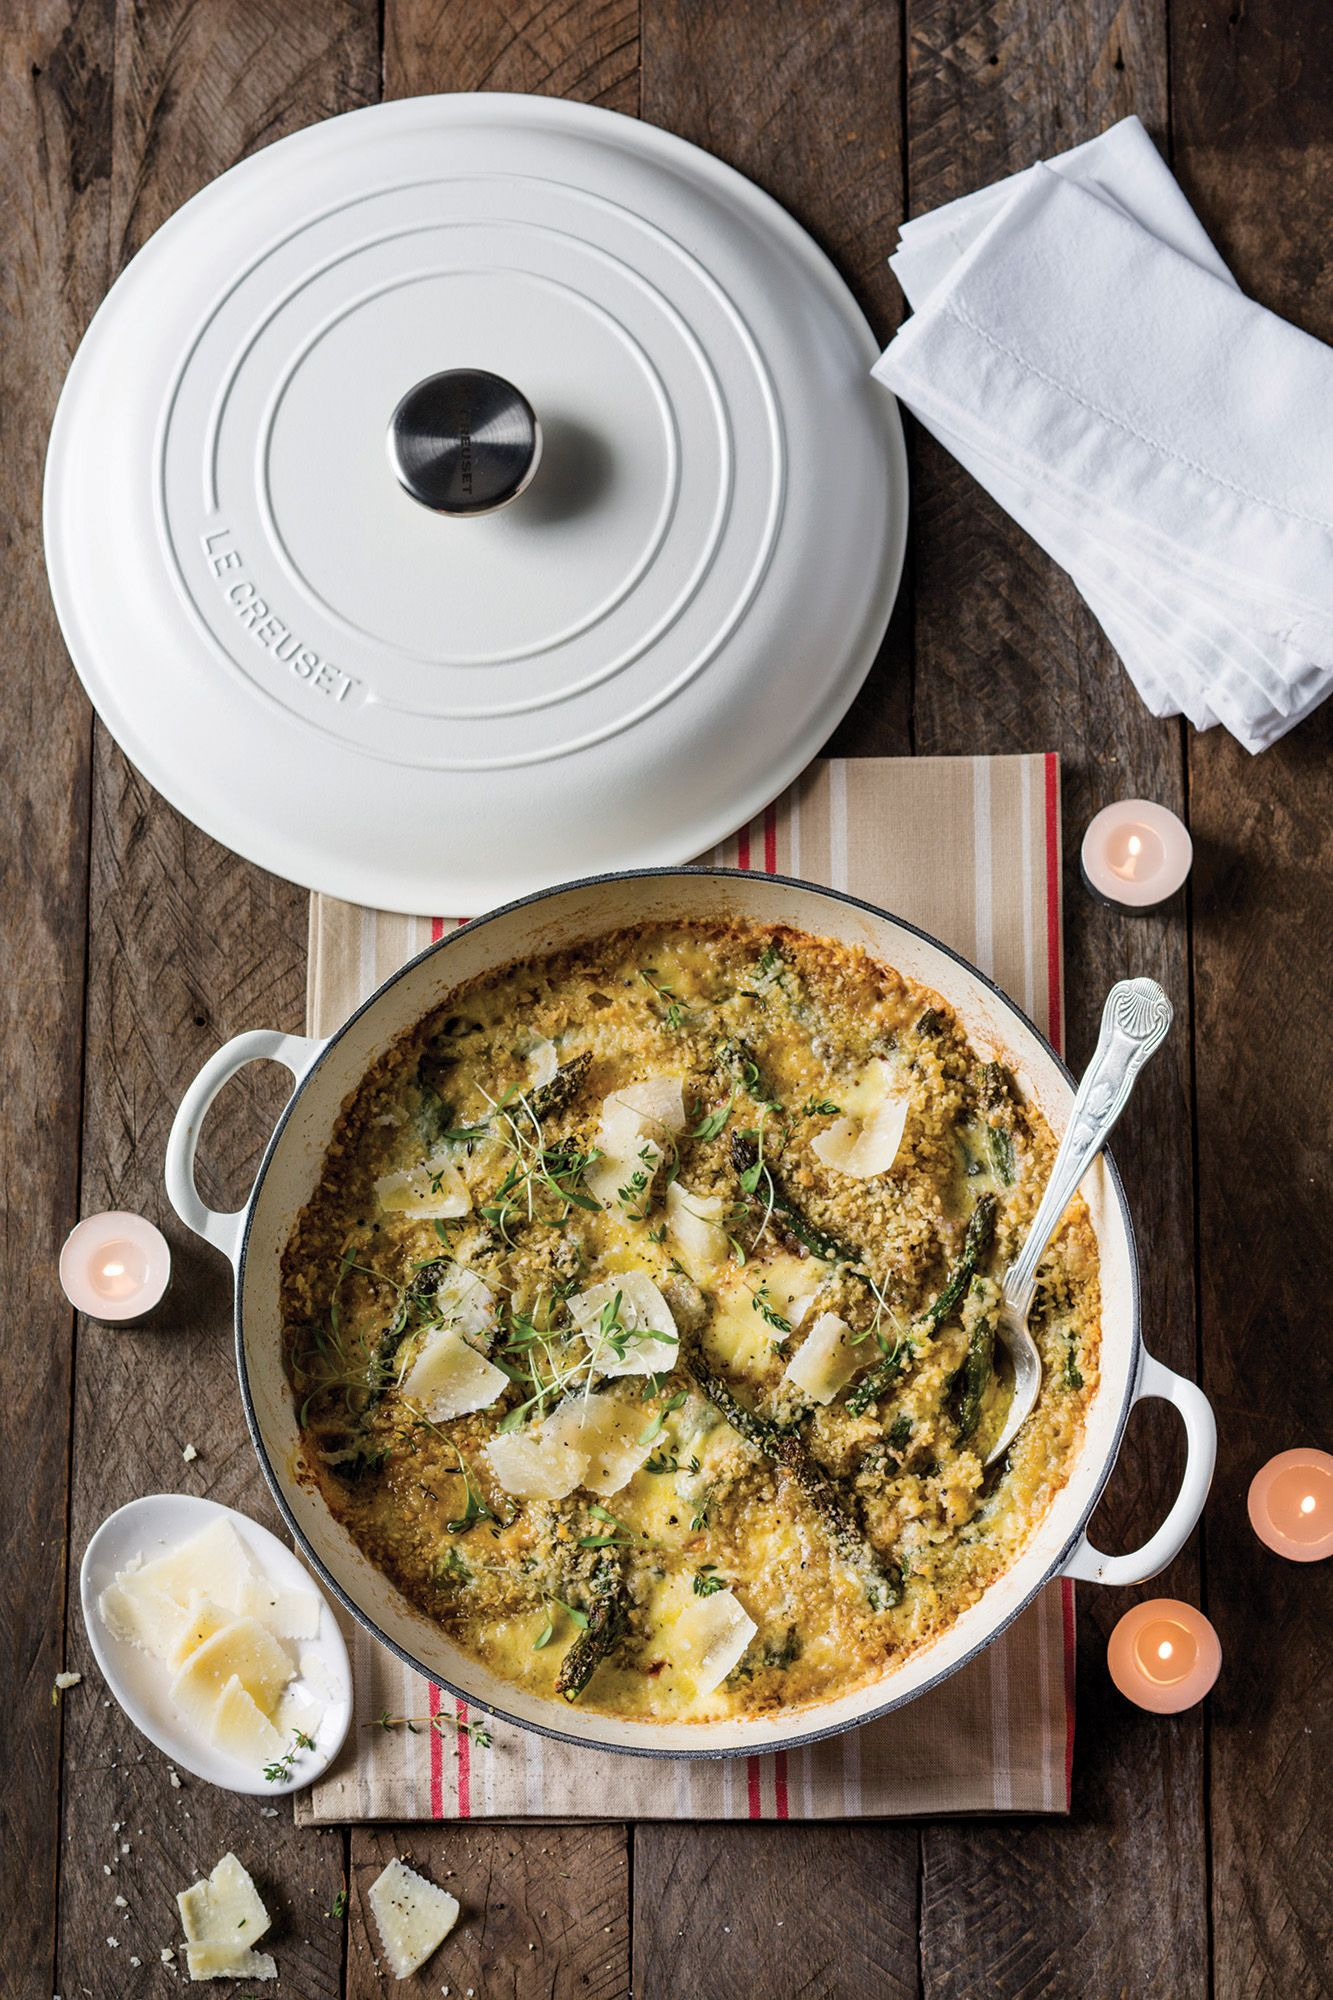 Le Creuset Cotton Classic Buffet Casserole // Asparagus and Mascarpone Gratin